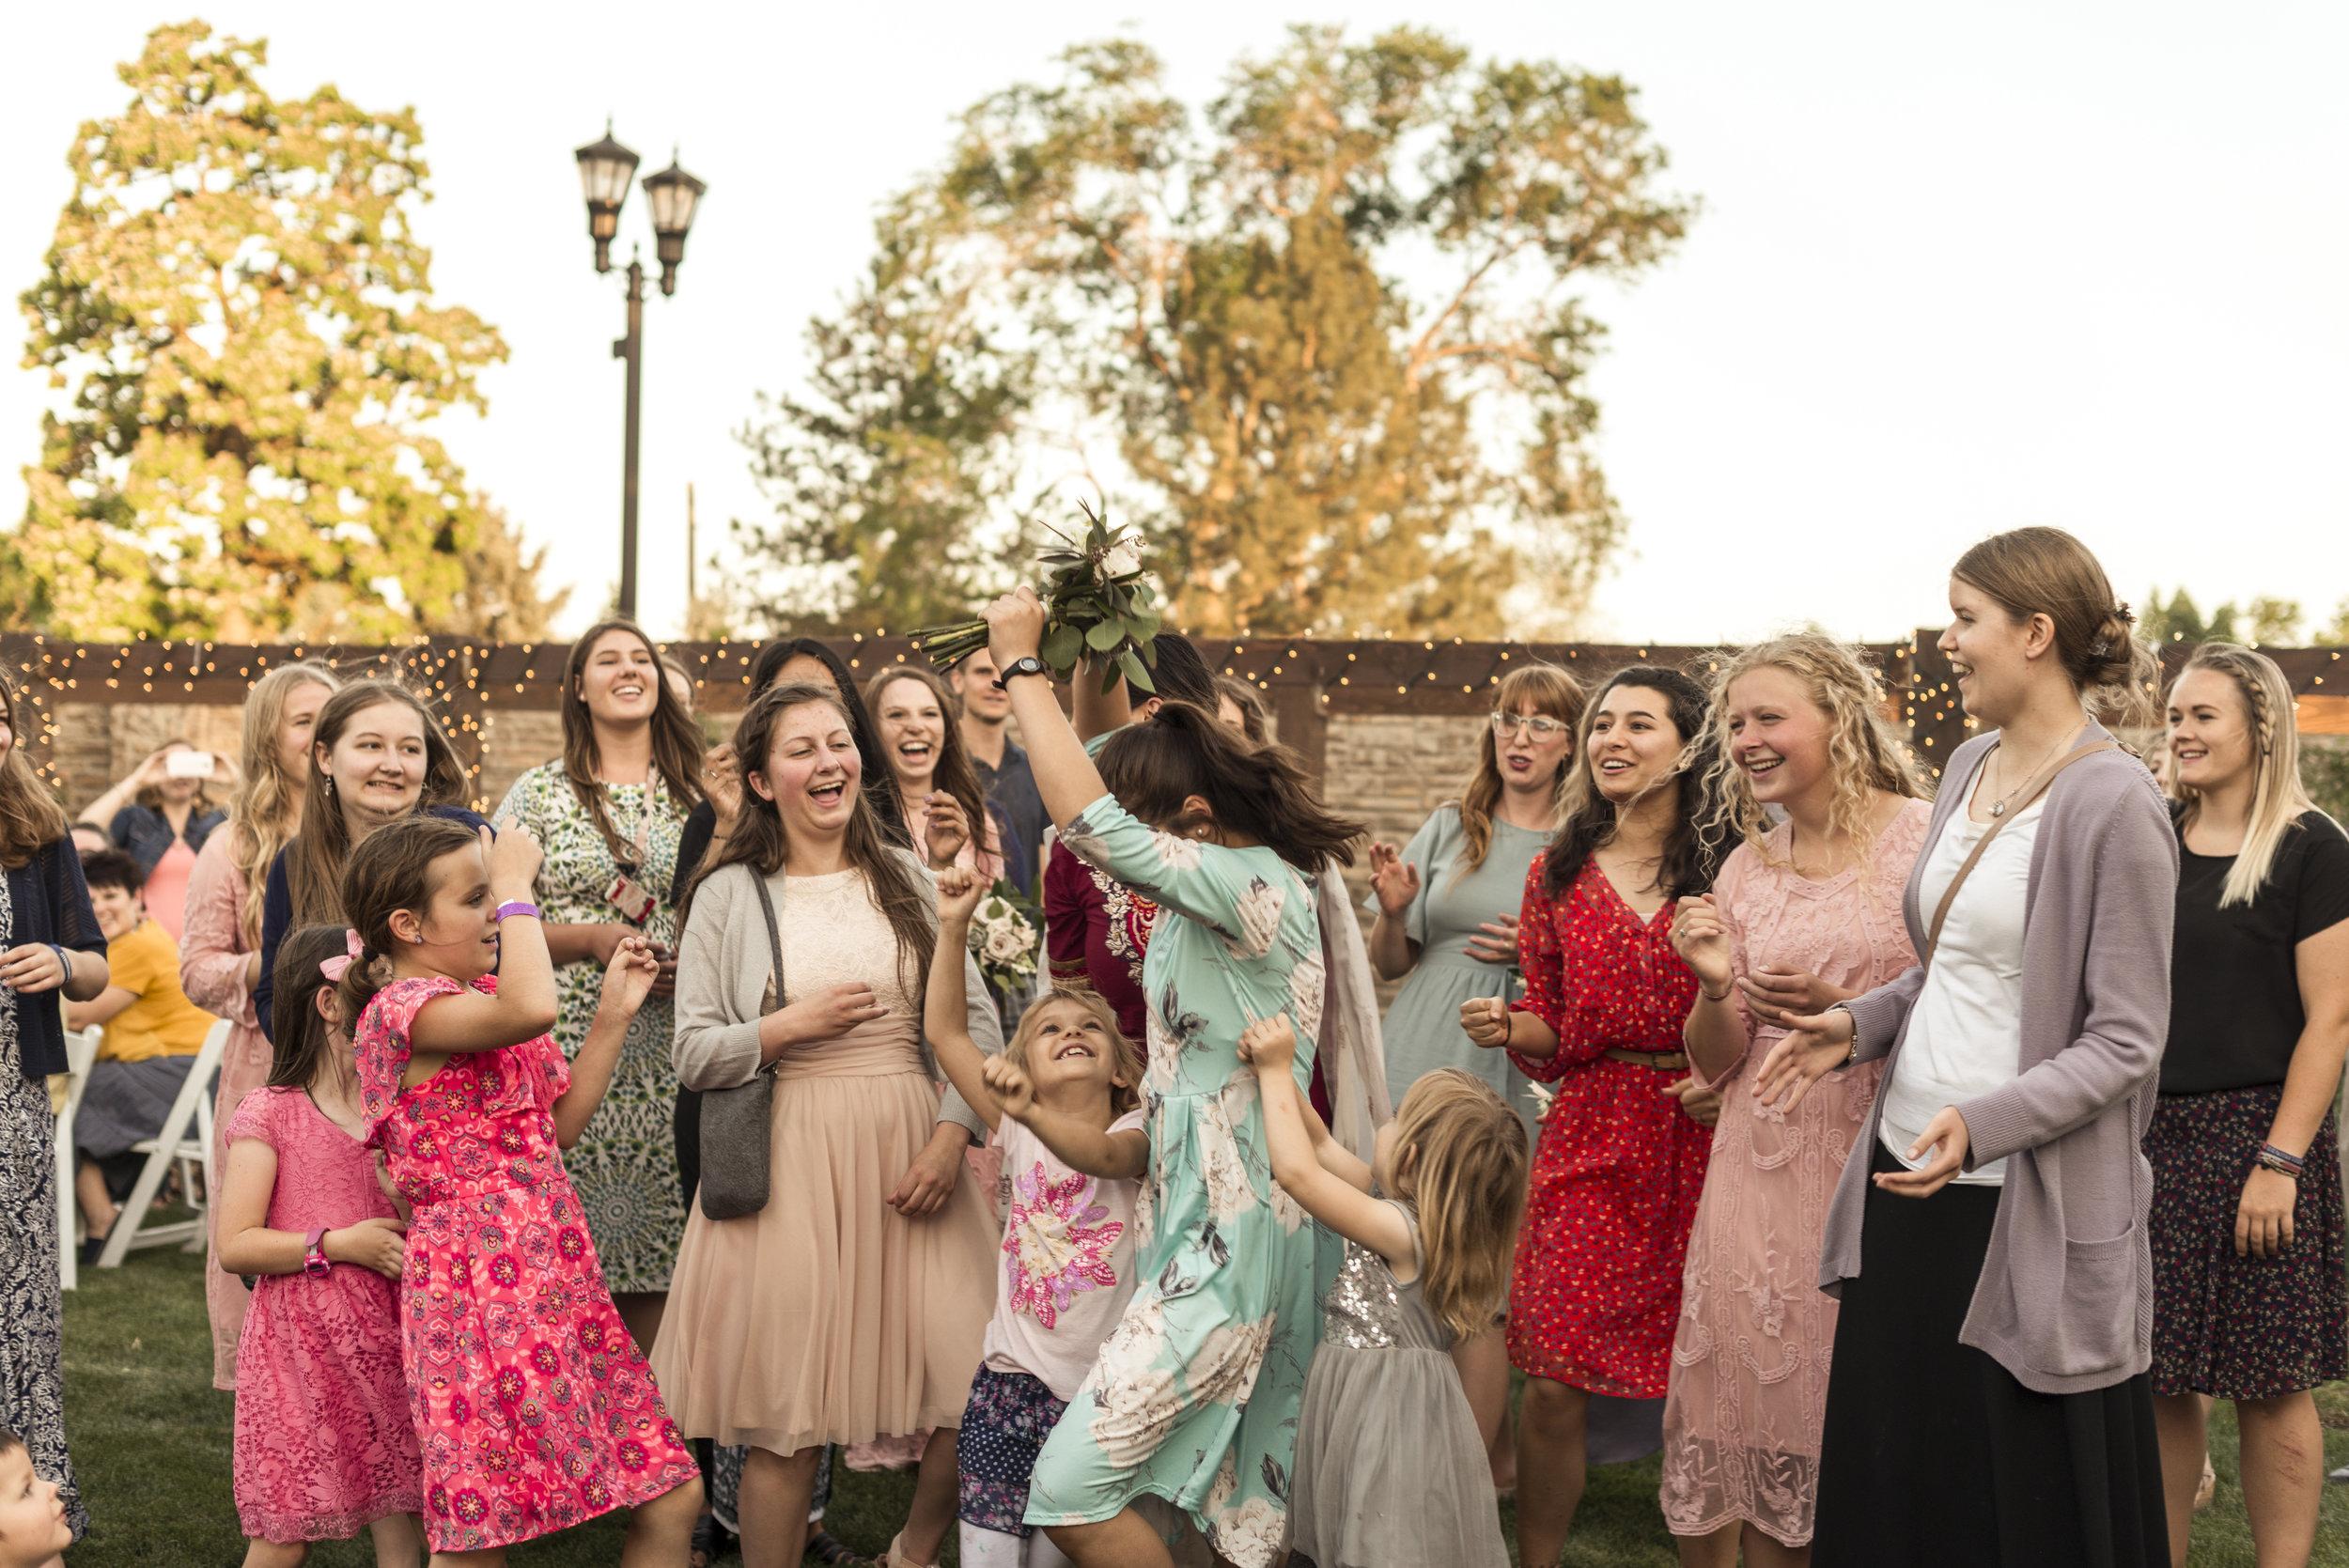 LDS Summer Wedding | South Jordan, Utah Wedding Photographer| Bri Bergman Photography 24.JPG